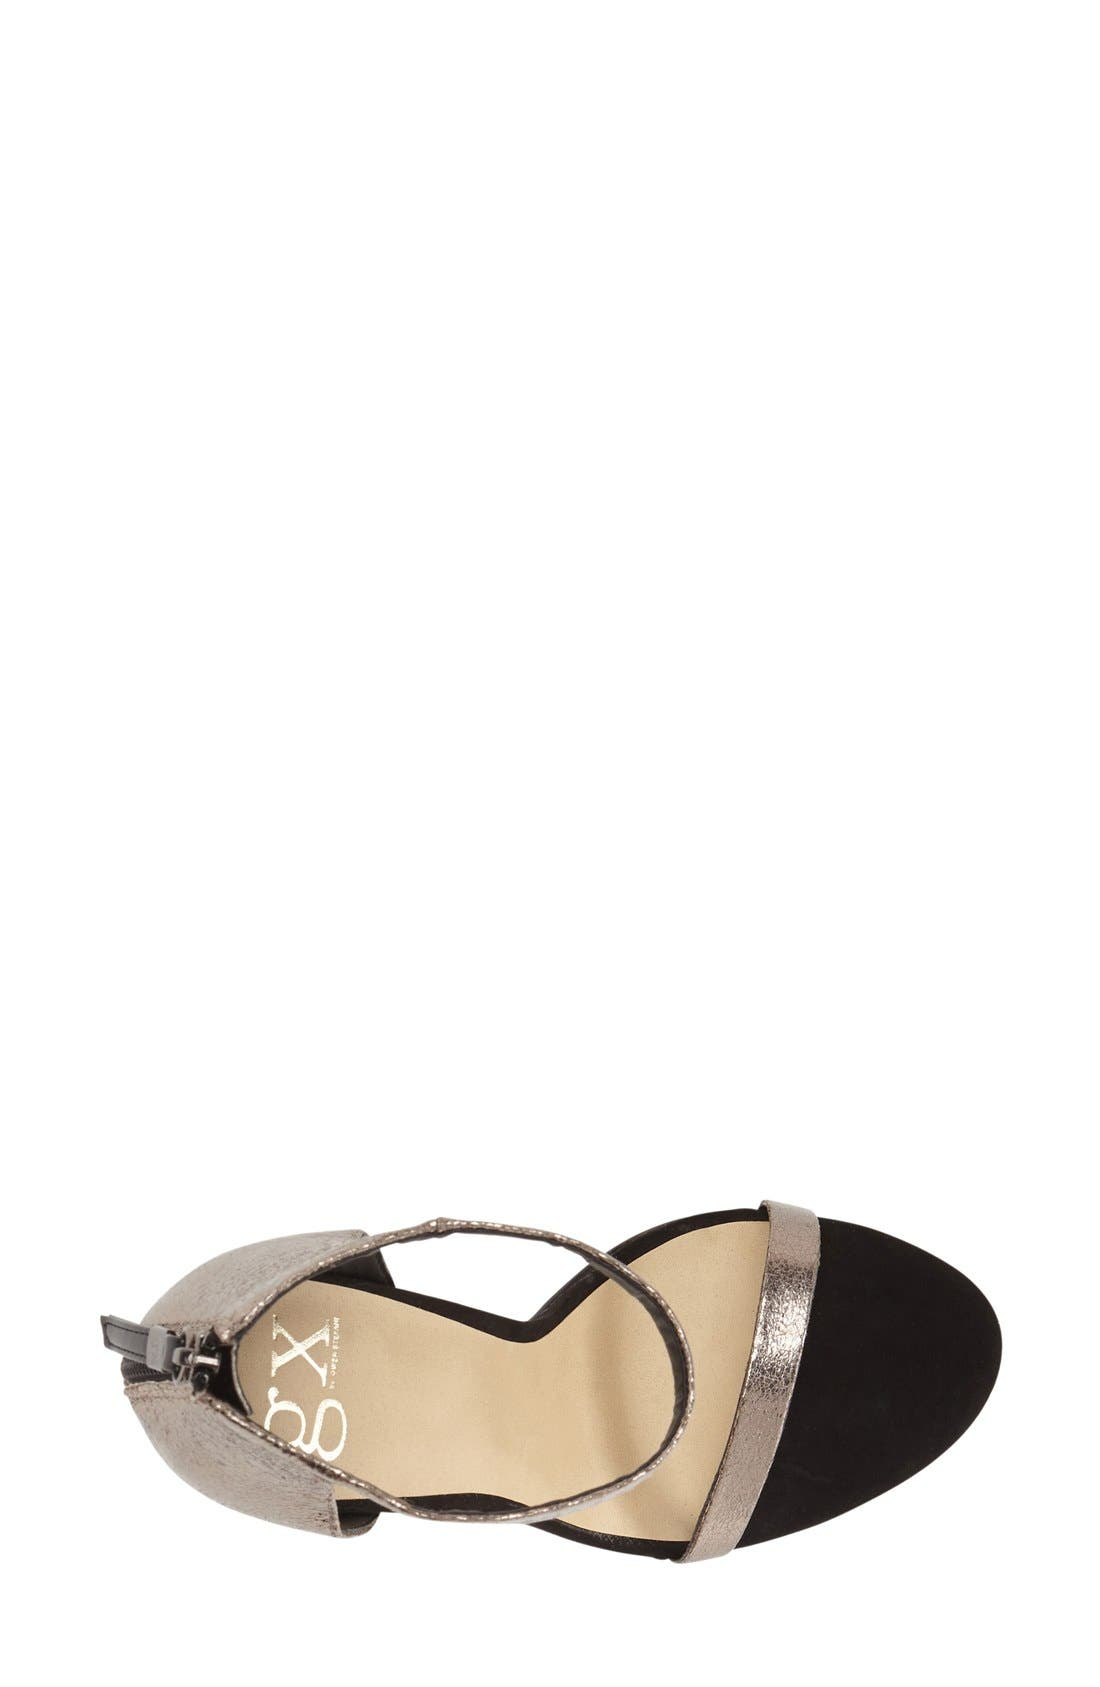 Alternate Image 3  - gx by Gwen Stefani 'Observe' Ankle Strap Sandal (Women)